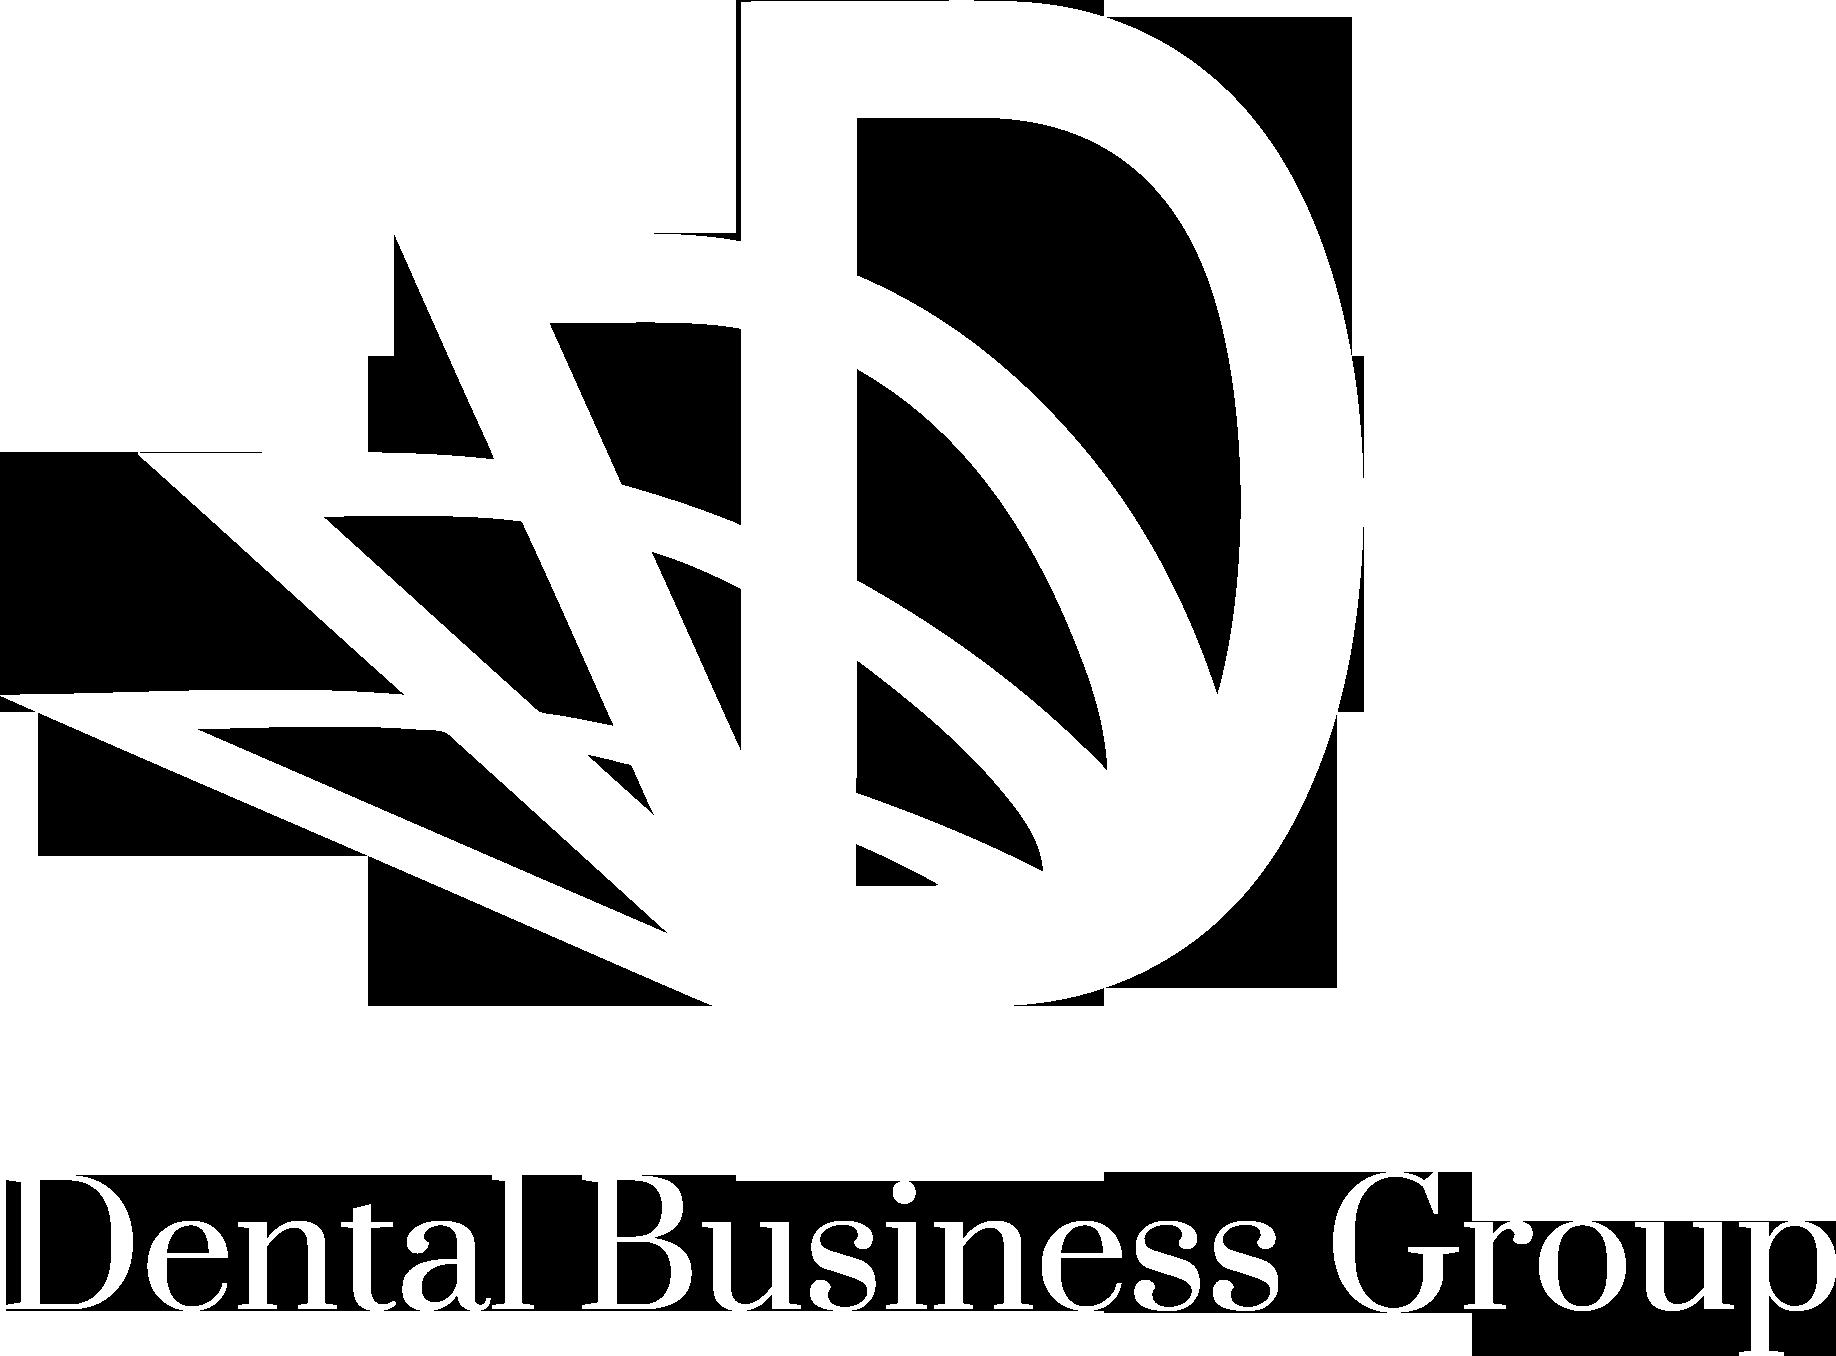 Dental  Business Groups kurser logo